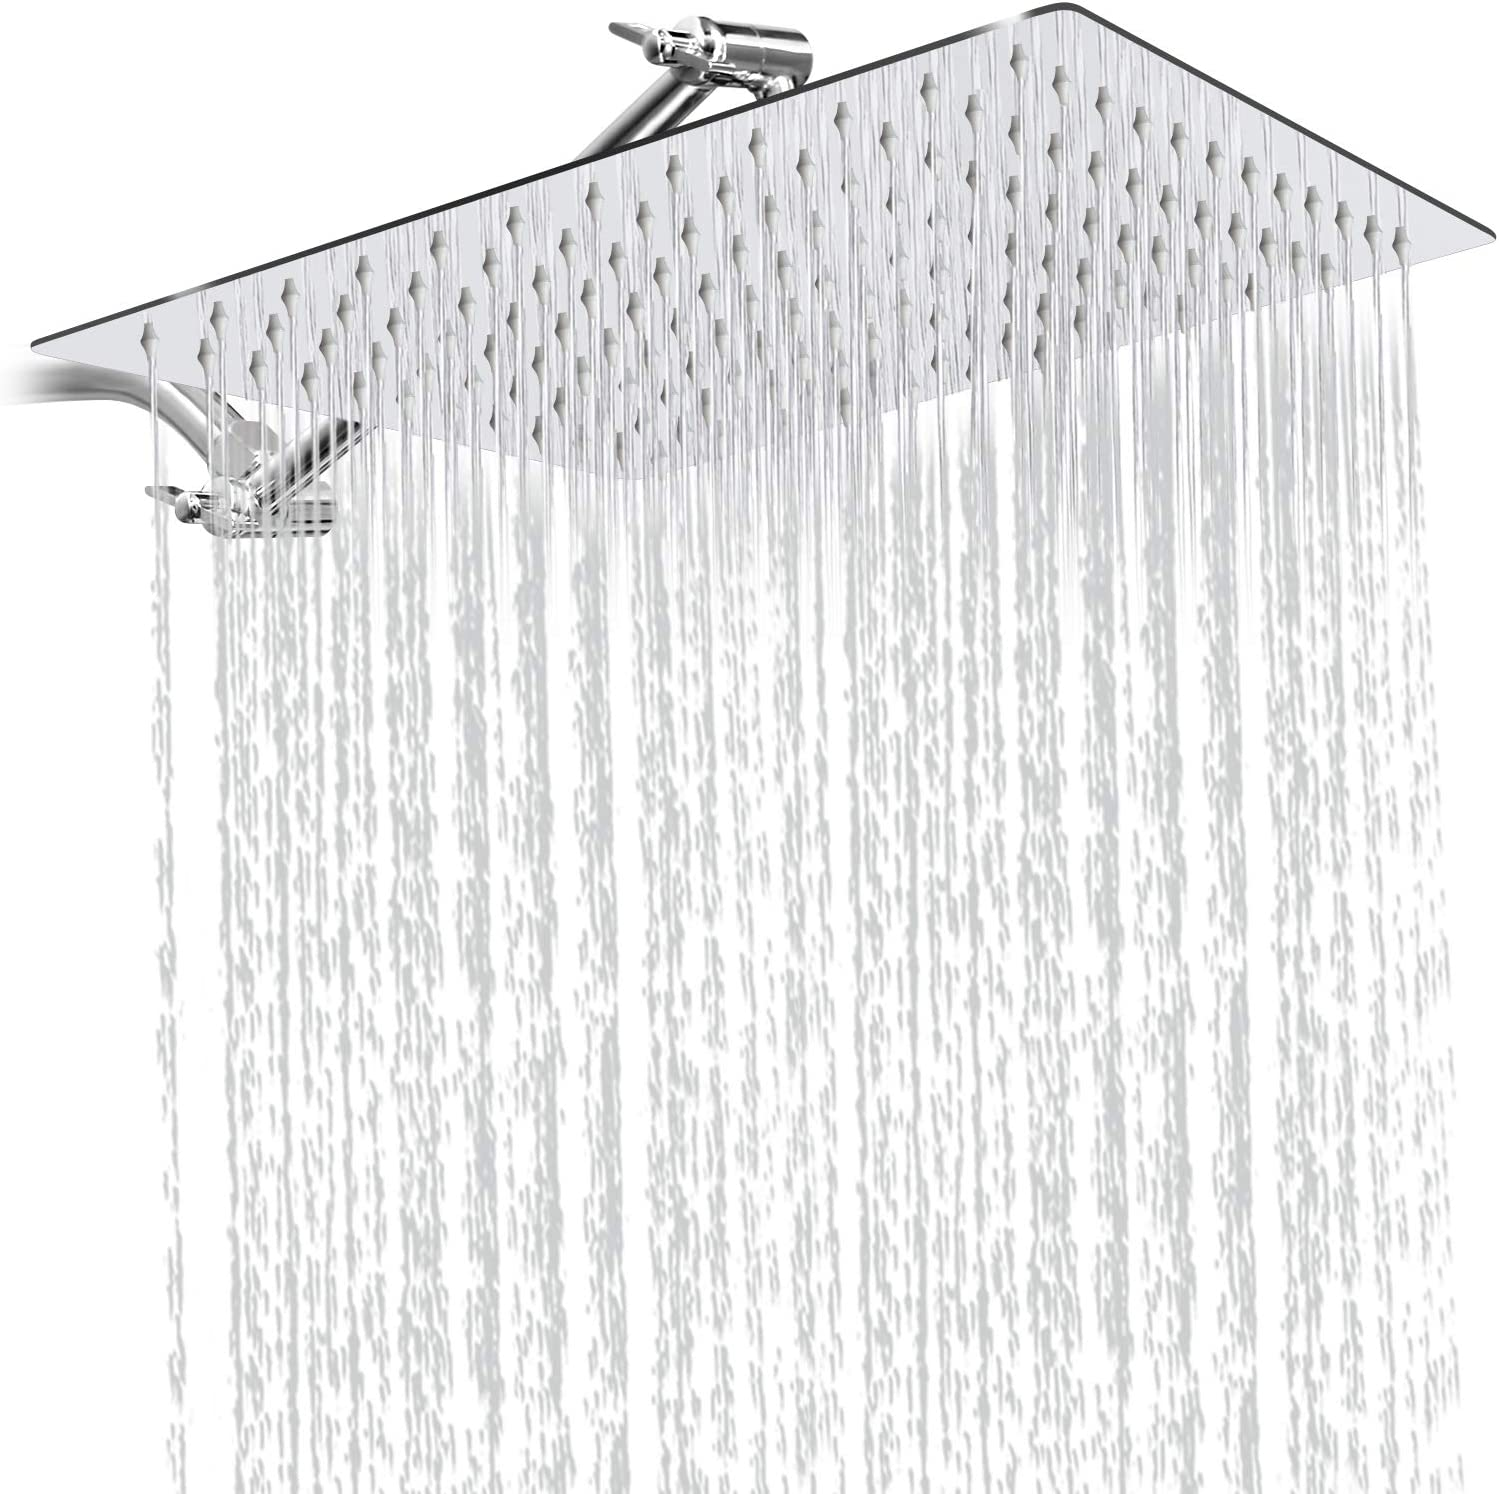 Sooreally Mesa Mall 12 Inch Square Rain Rainfall Head New sales Pressure Shower High